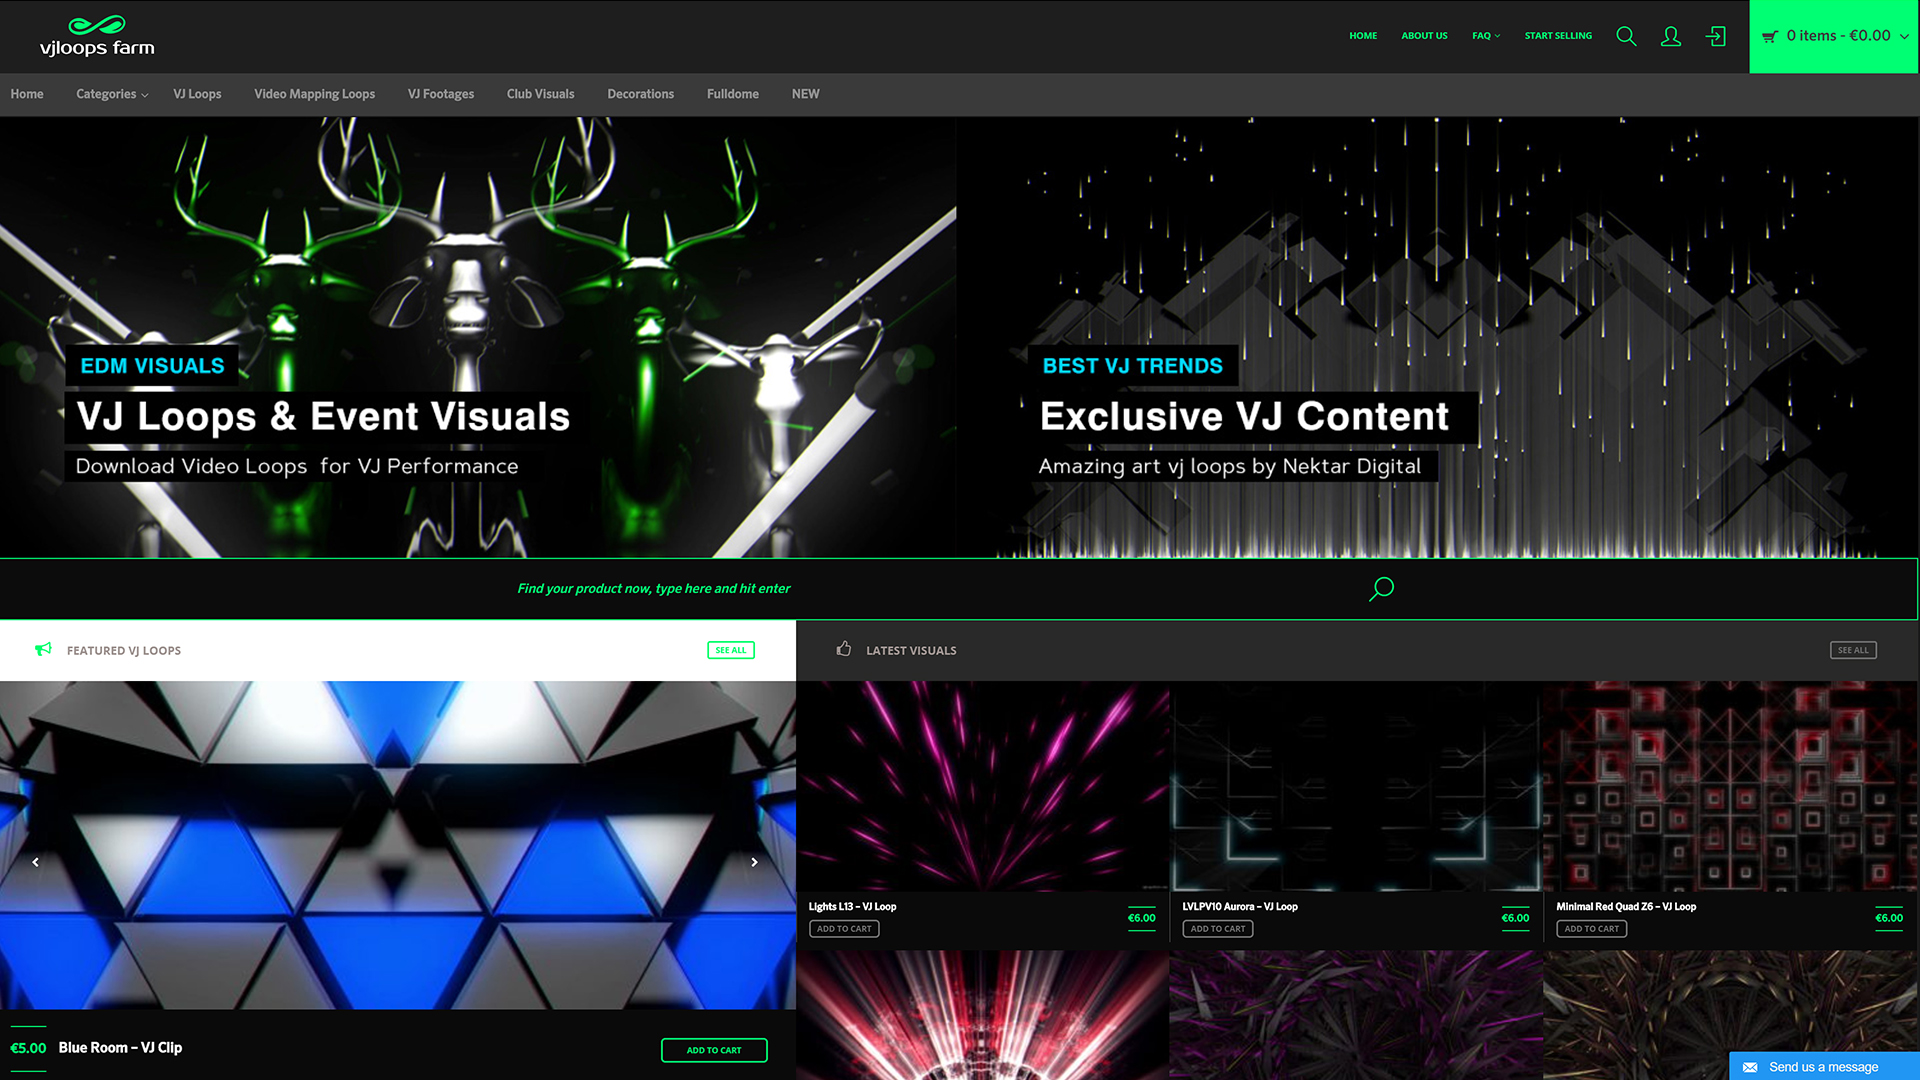 VJ Loops Farm ✅ Video Art Marketplace 4K Video VJ Clips Stock